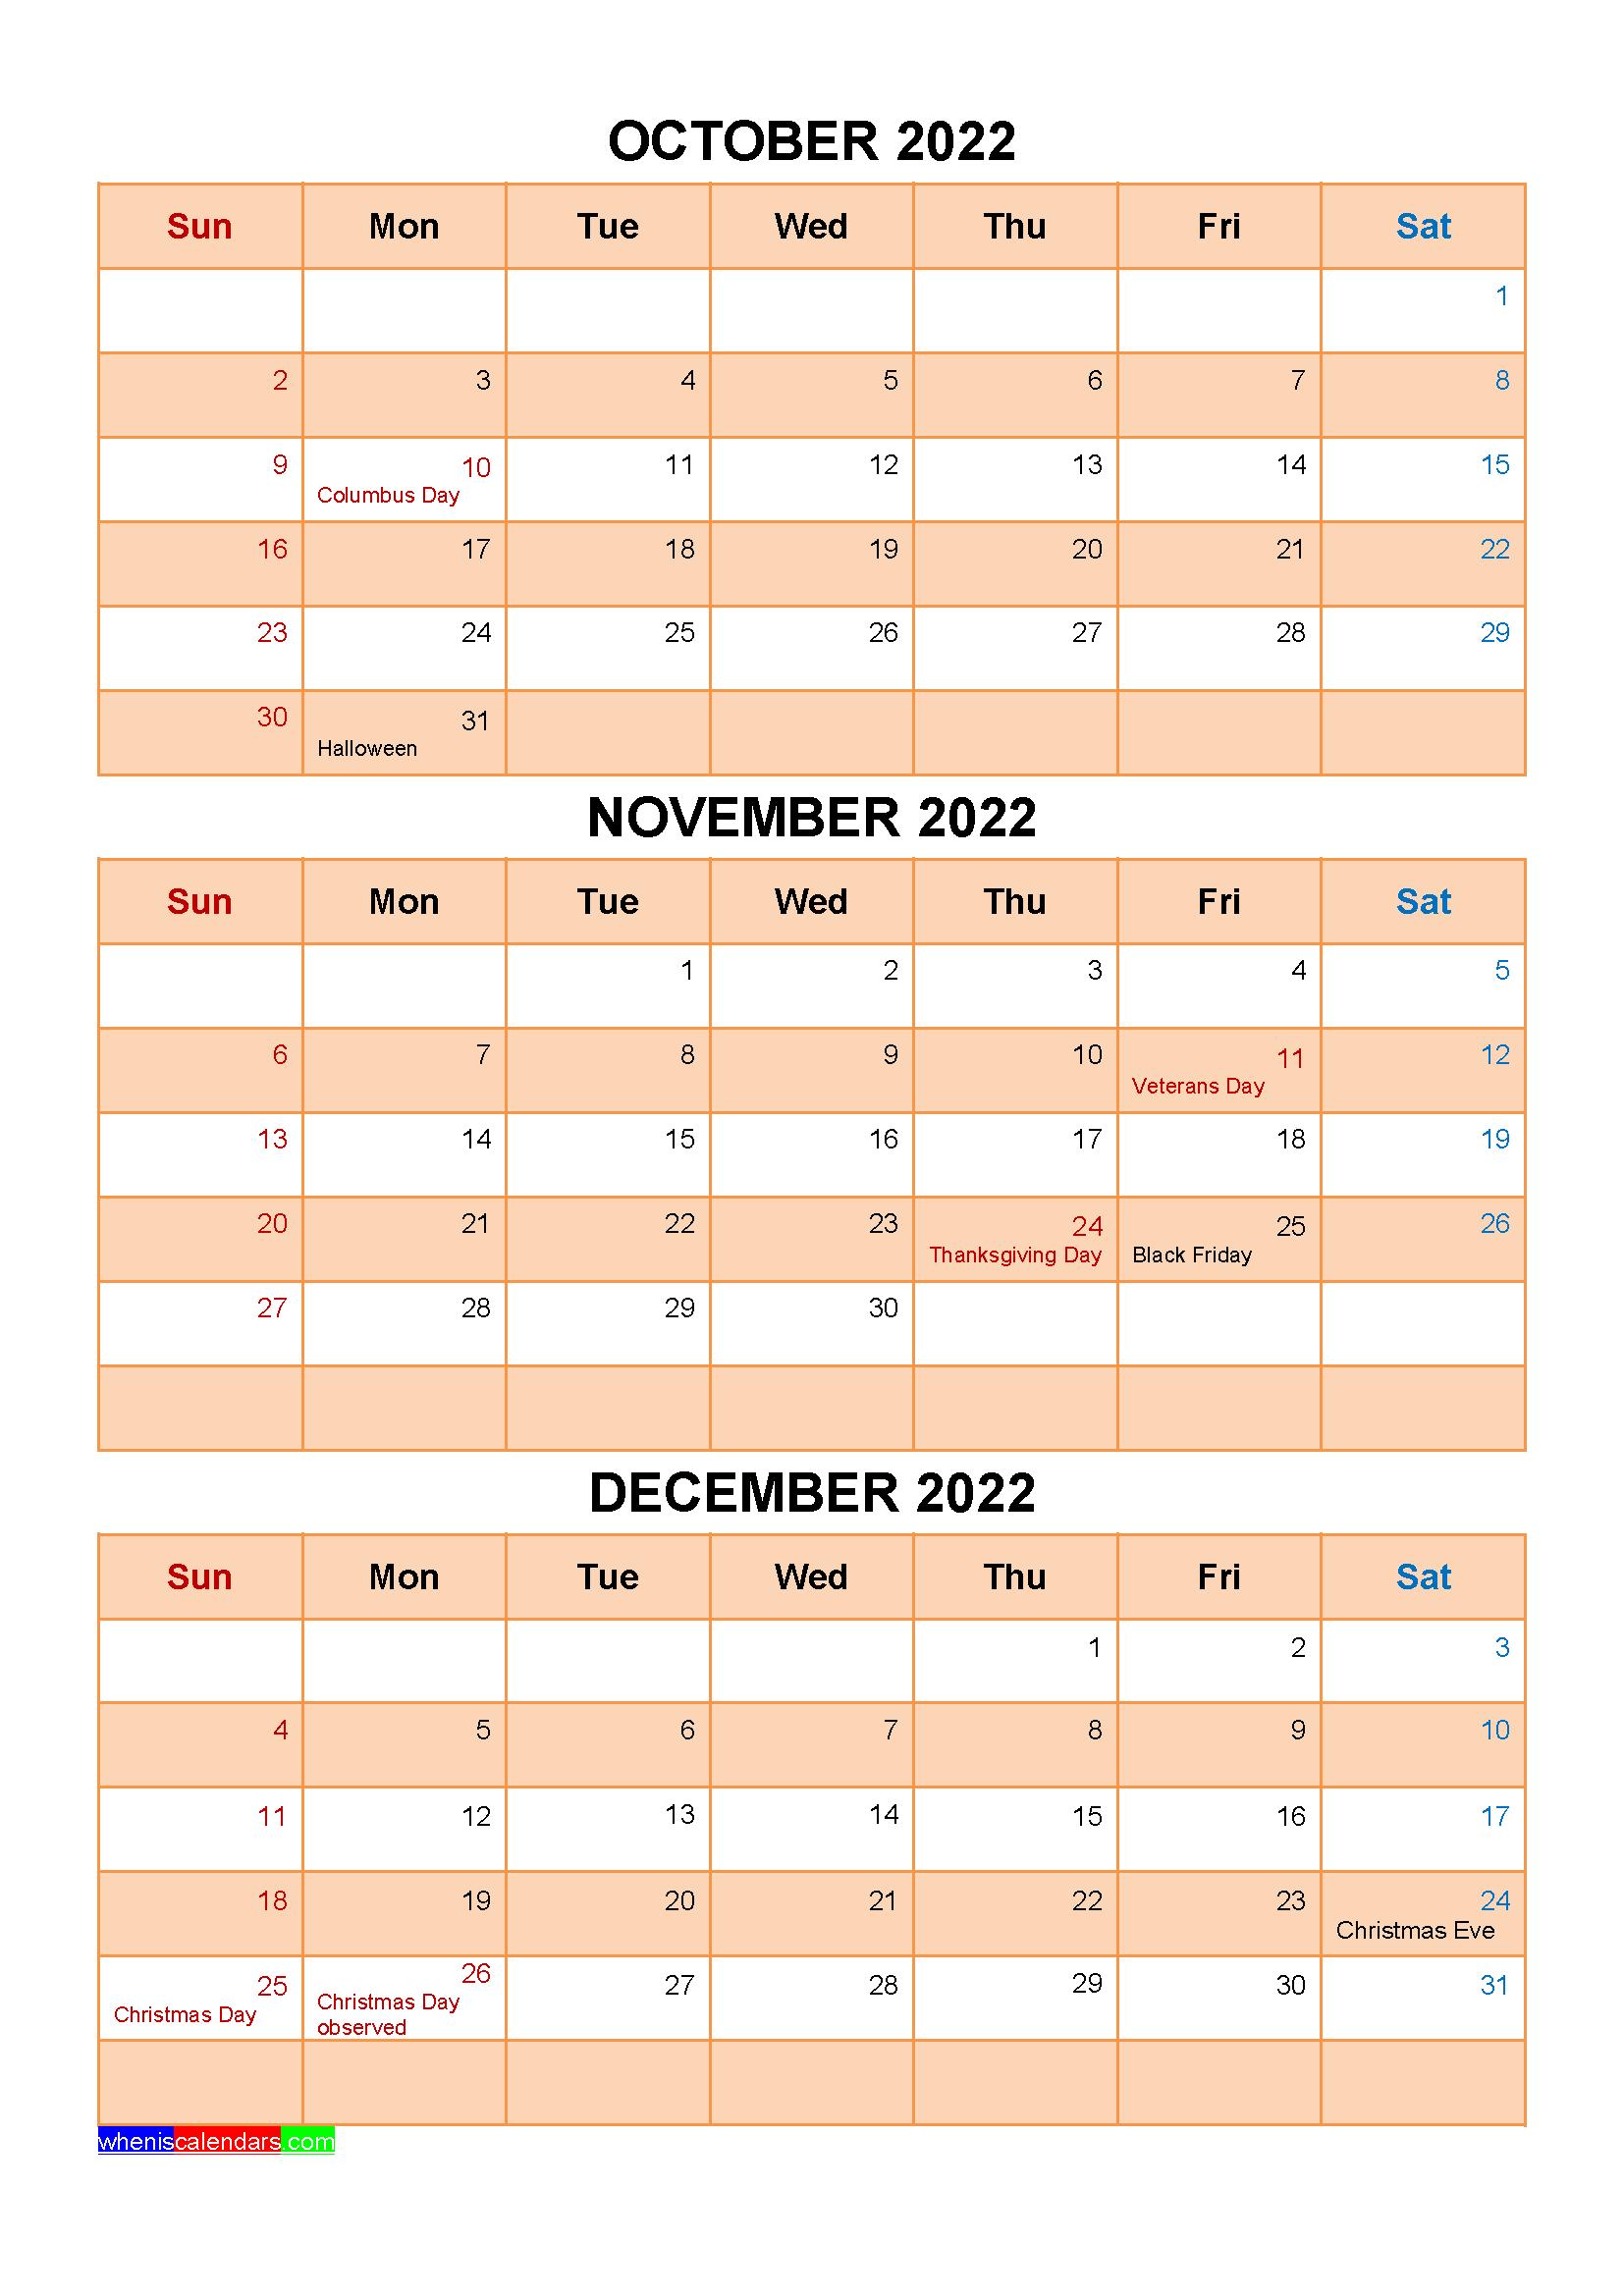 December 2022 Calendar With Holidays.Printable October November December 2022 Calendar With Holidays Four Quarters January February March Holiday Printables Calendar Printables